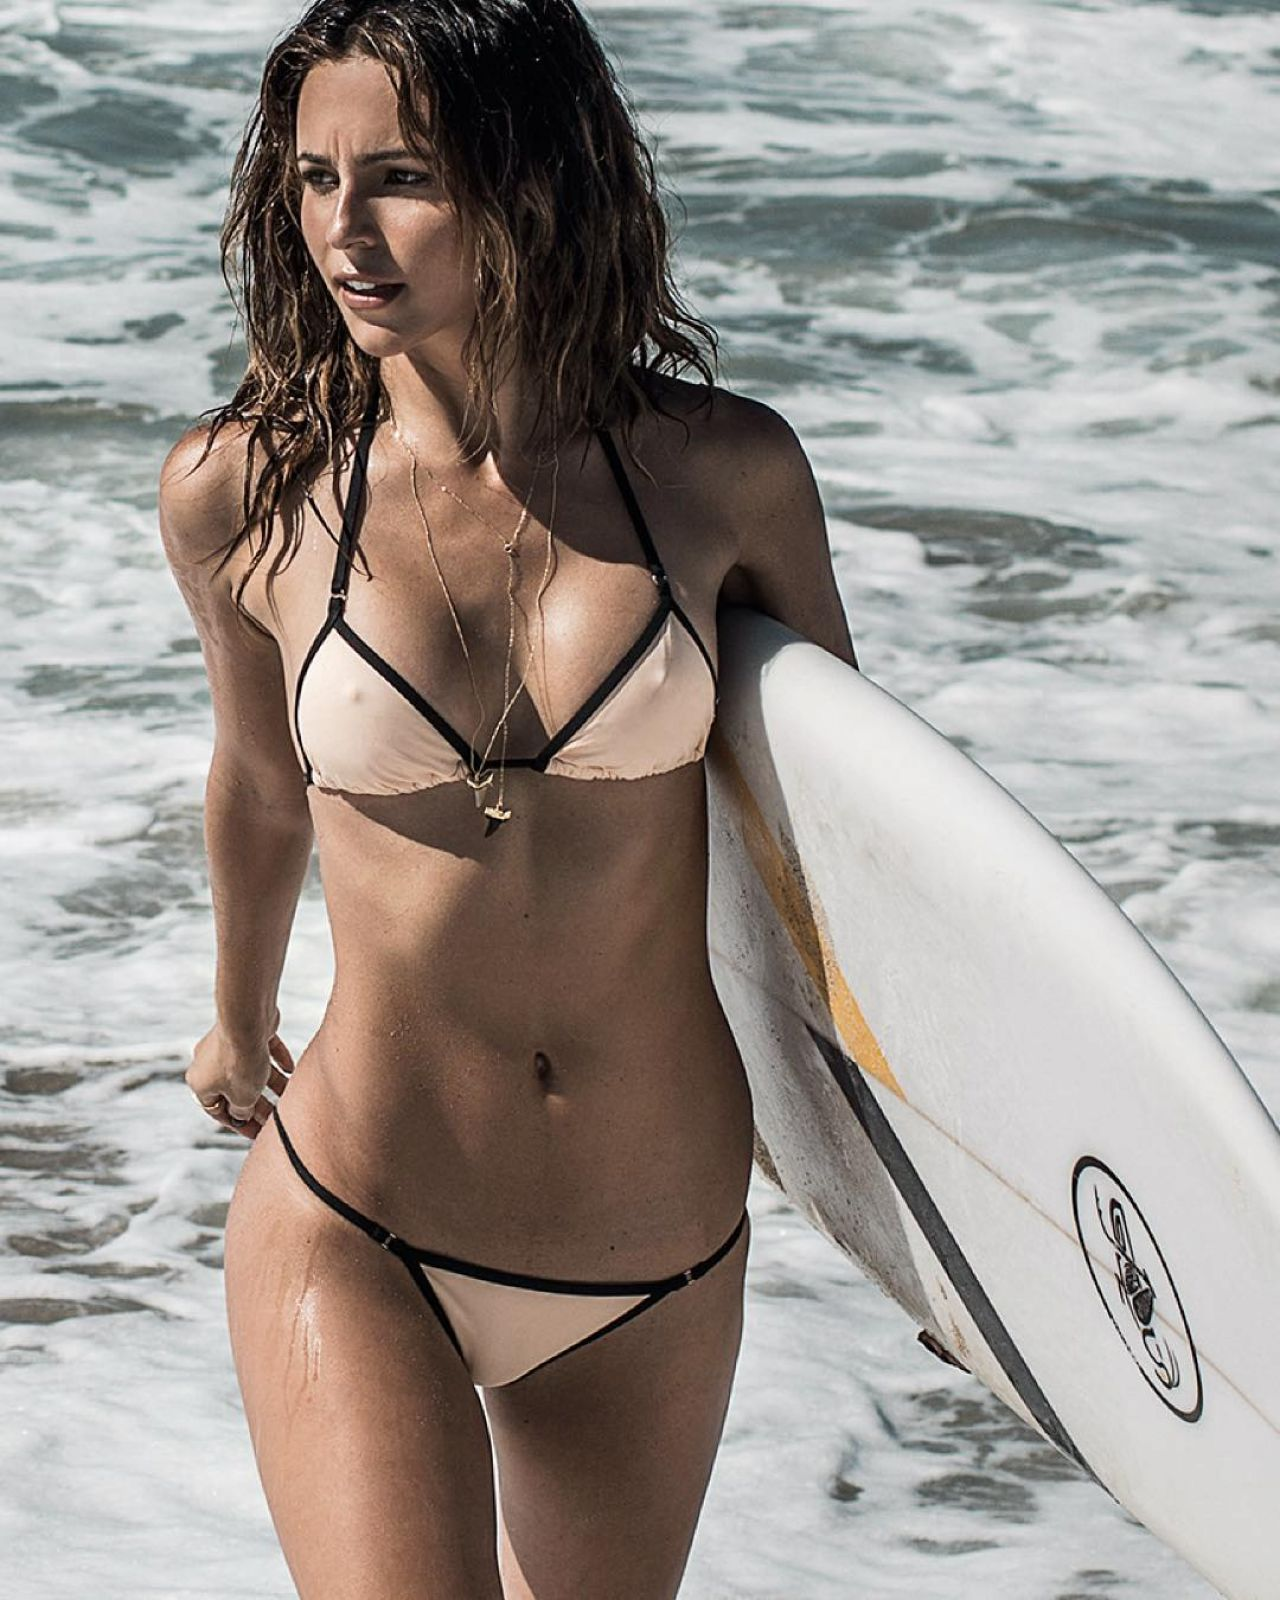 Bikini Amanda Pizziconi nude photos 2019